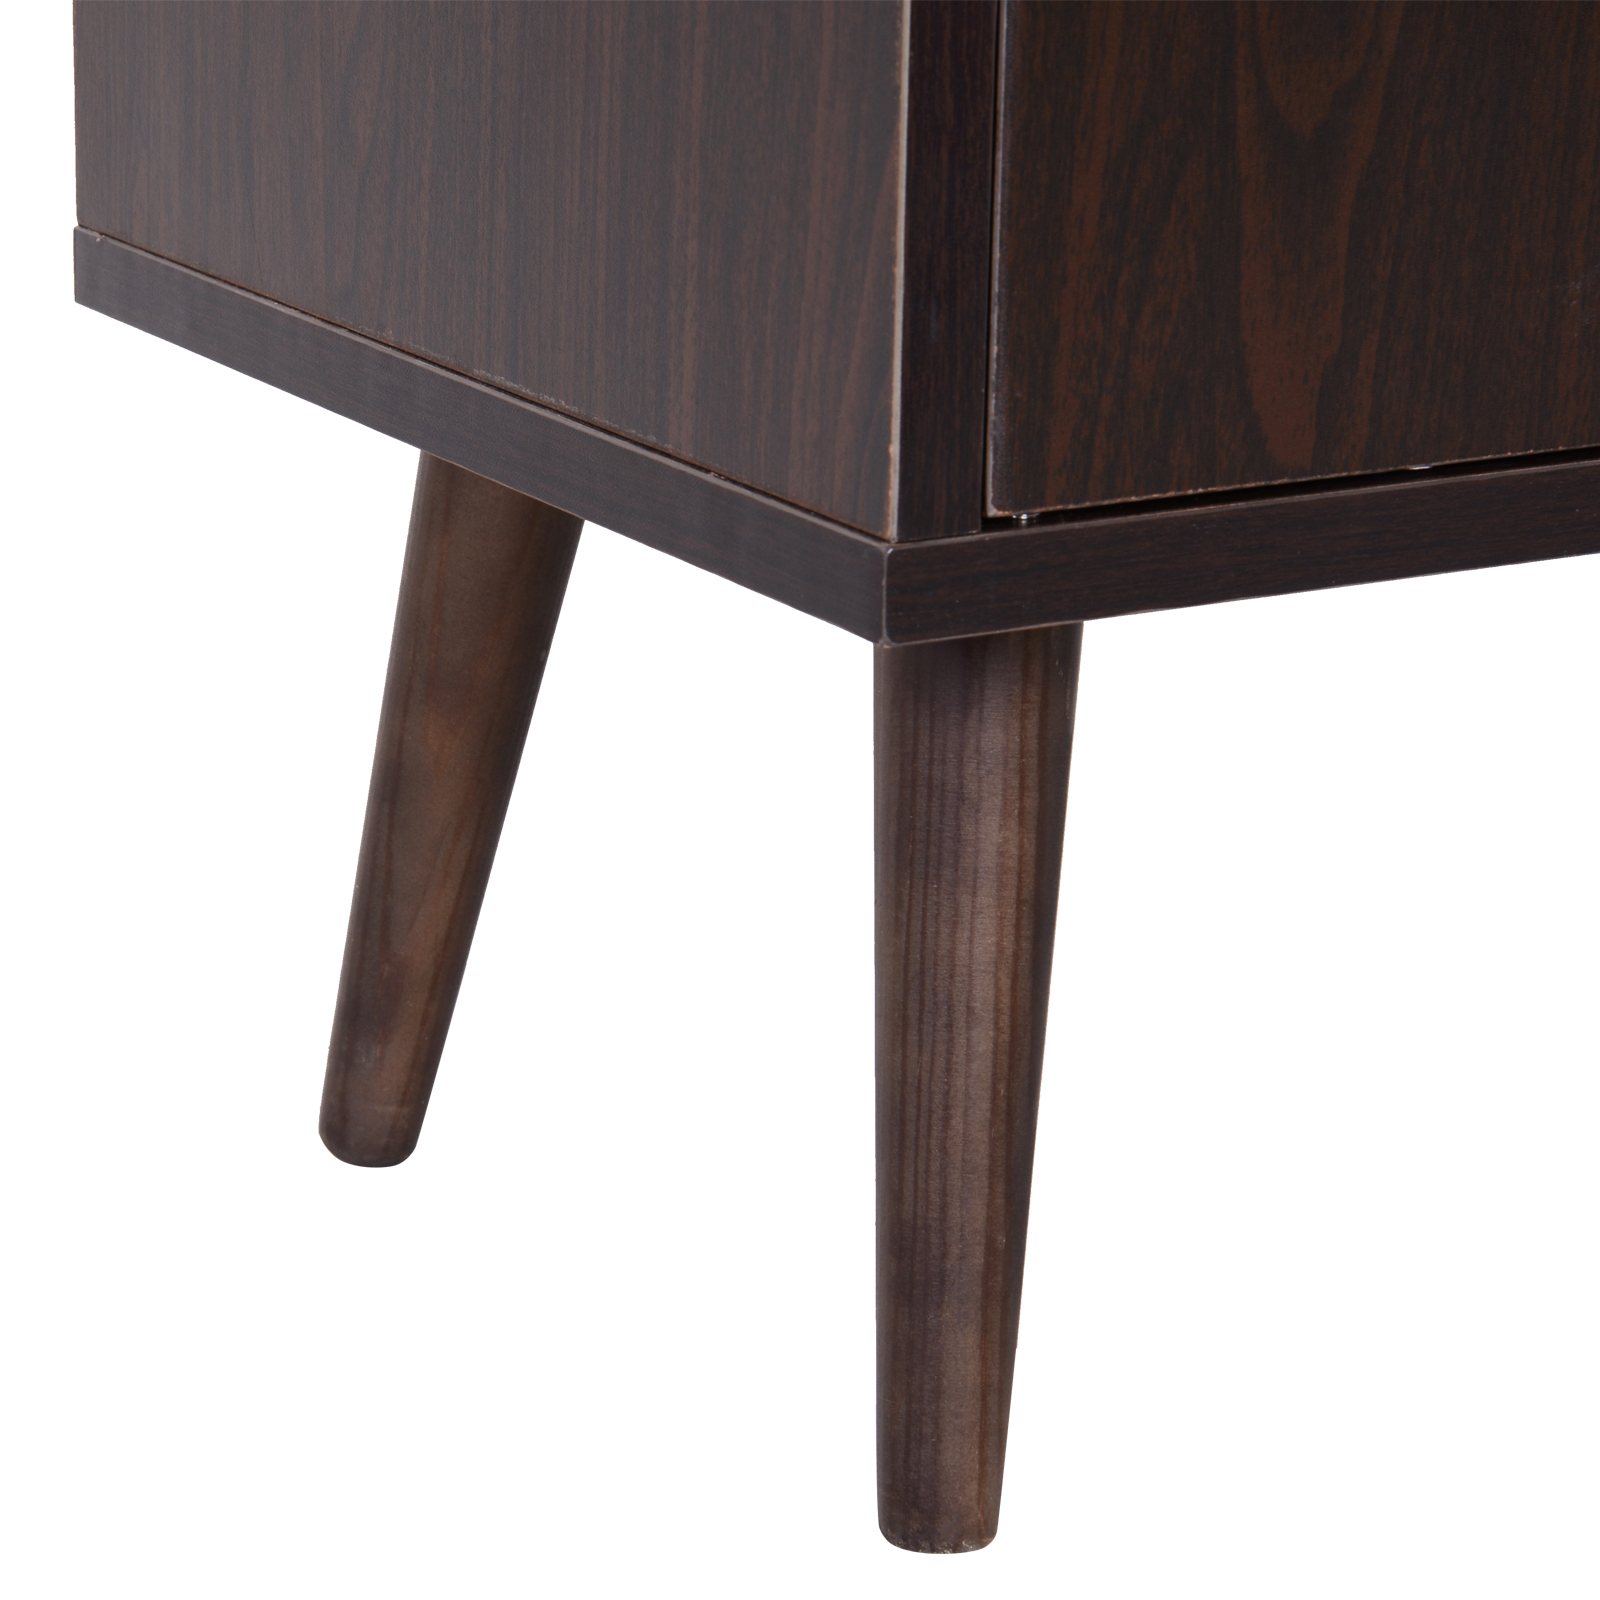 thumbnail 8 - Side-Cabinet-Hallway-Storage-Unit-Console-Table-Entrance-Shelf-Cupboard-2-color